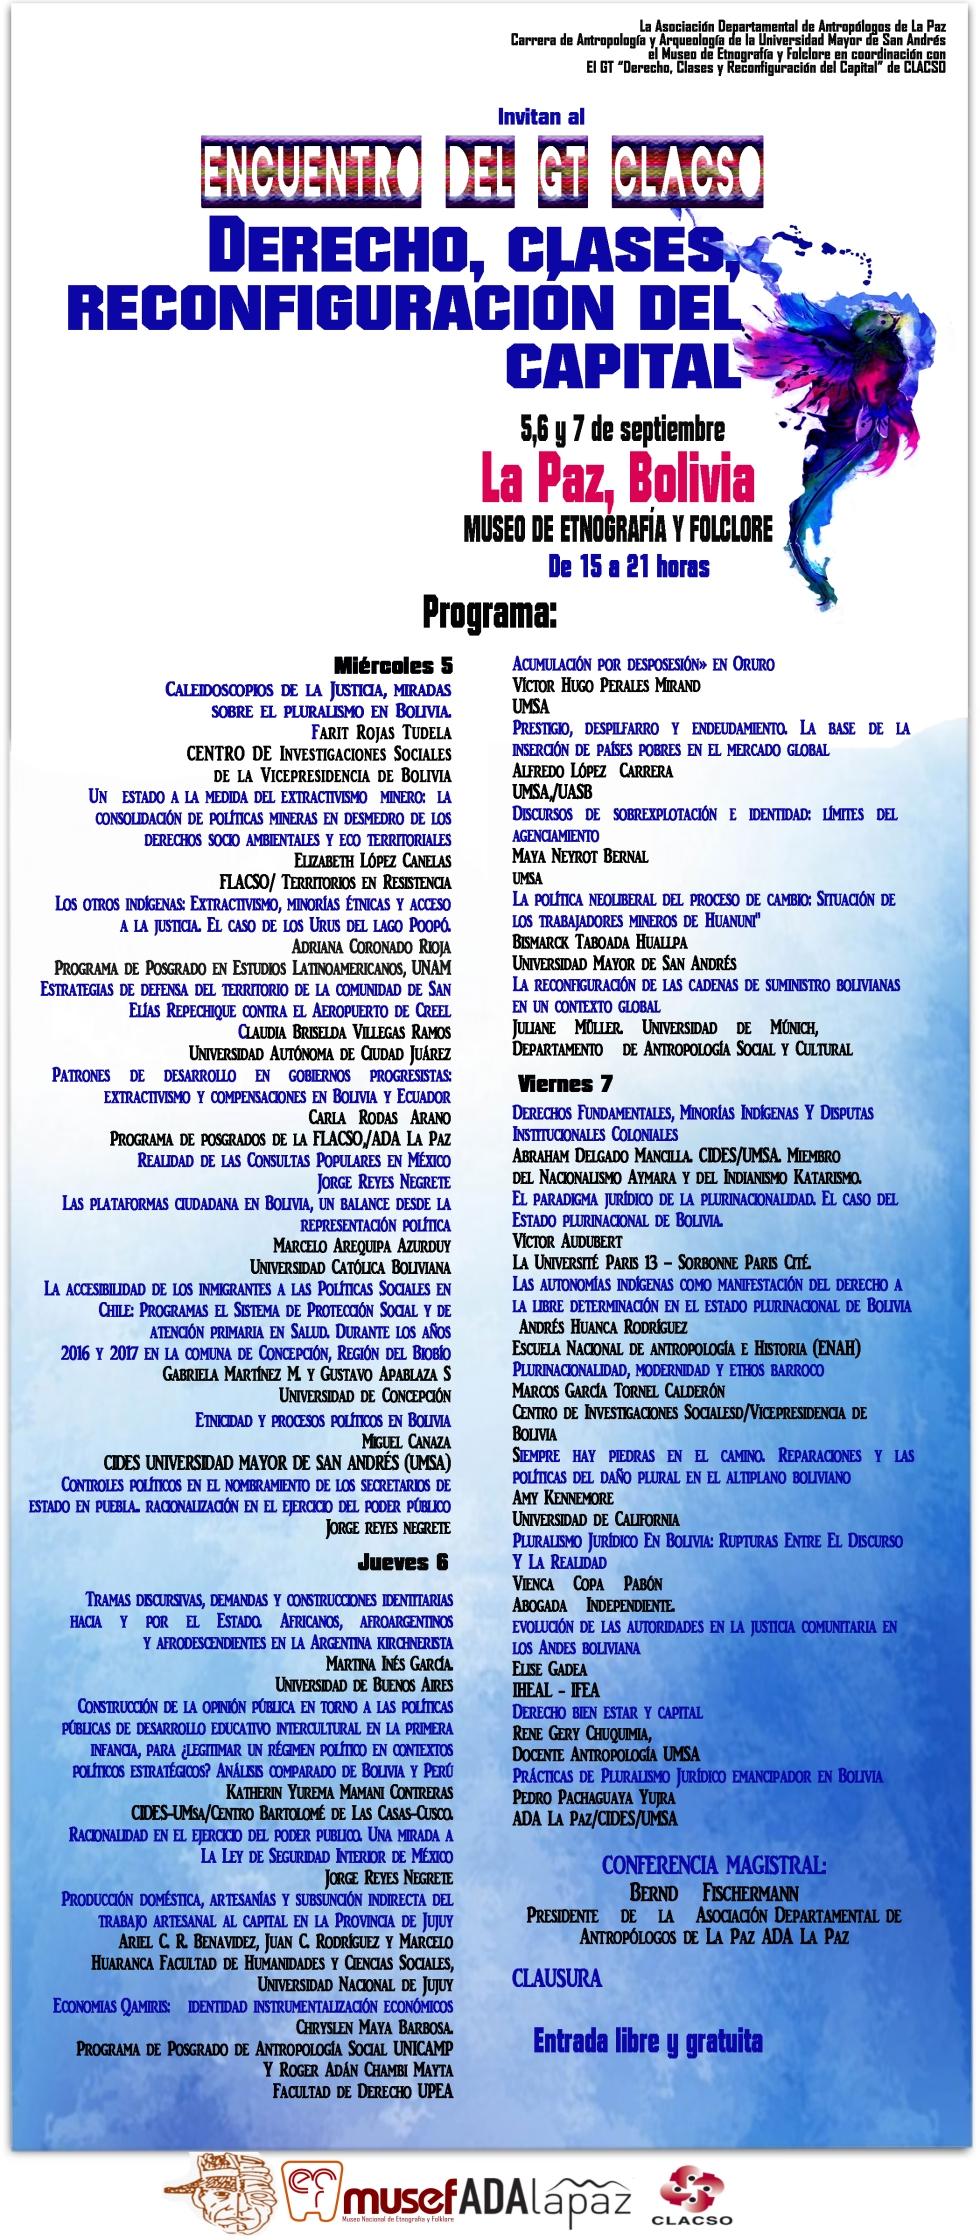 23. AGOSTO. cartelbolivia. DERECHO, CLASES, RECONFIGURACIÓN DEL CAPITAL. psd